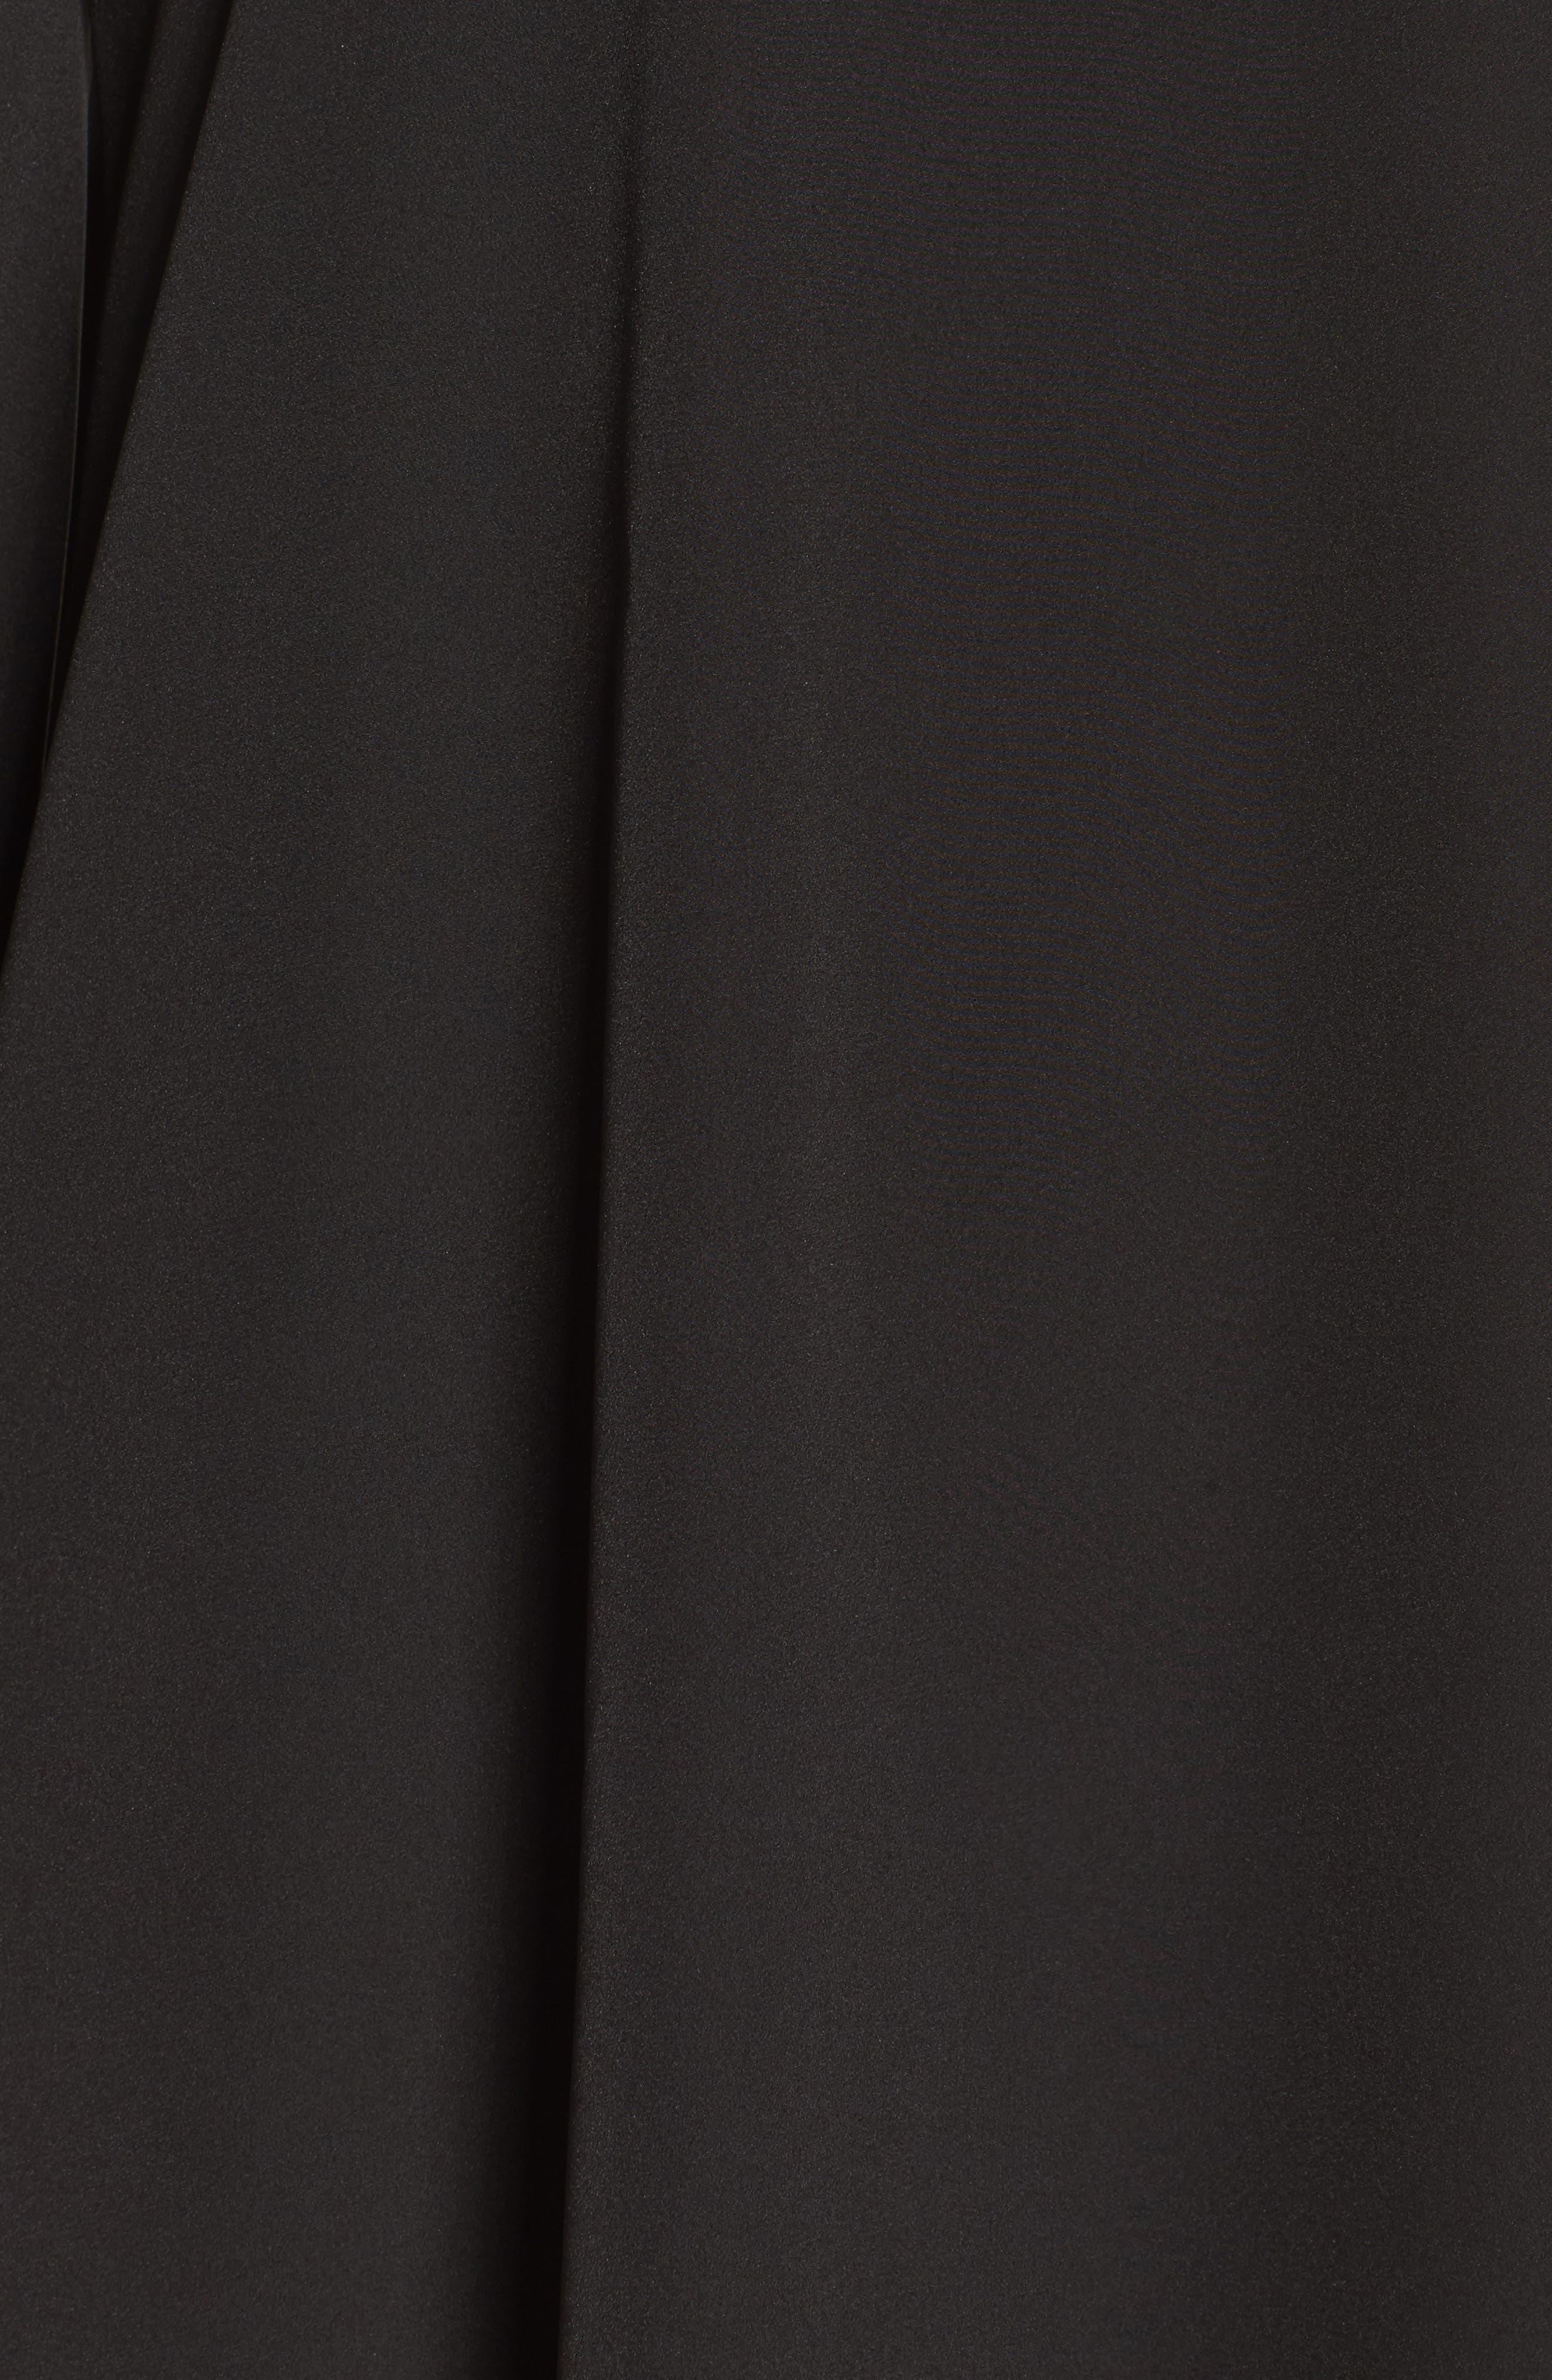 A BY AMANDA,                             Luella One-Shoulder Dress,                             Alternate thumbnail 4, color,                             001